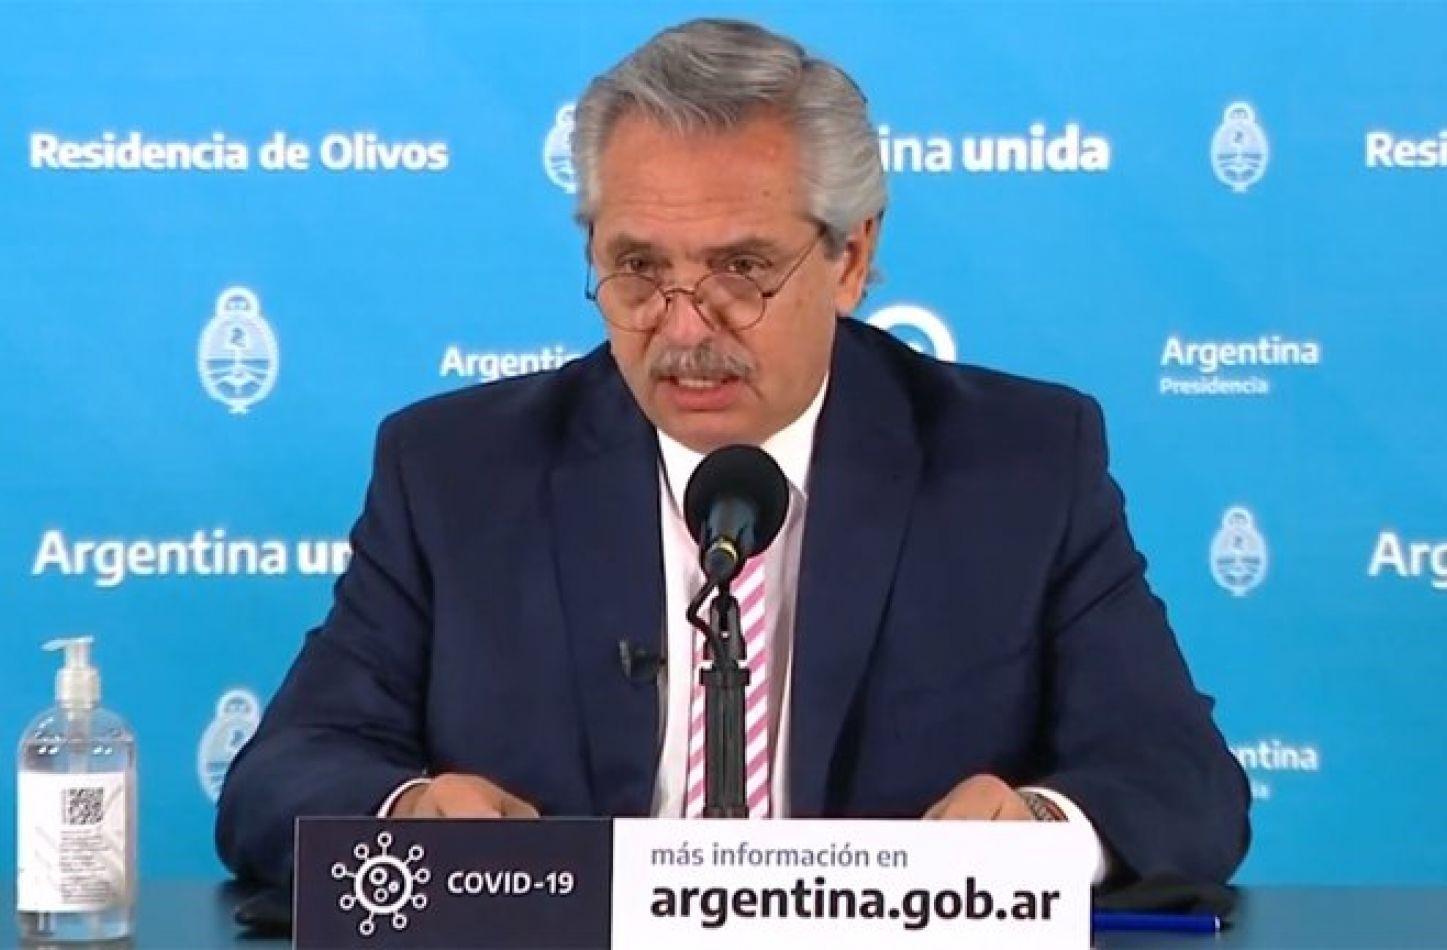 argentina vaccino coronavirus oxford astrazeneca